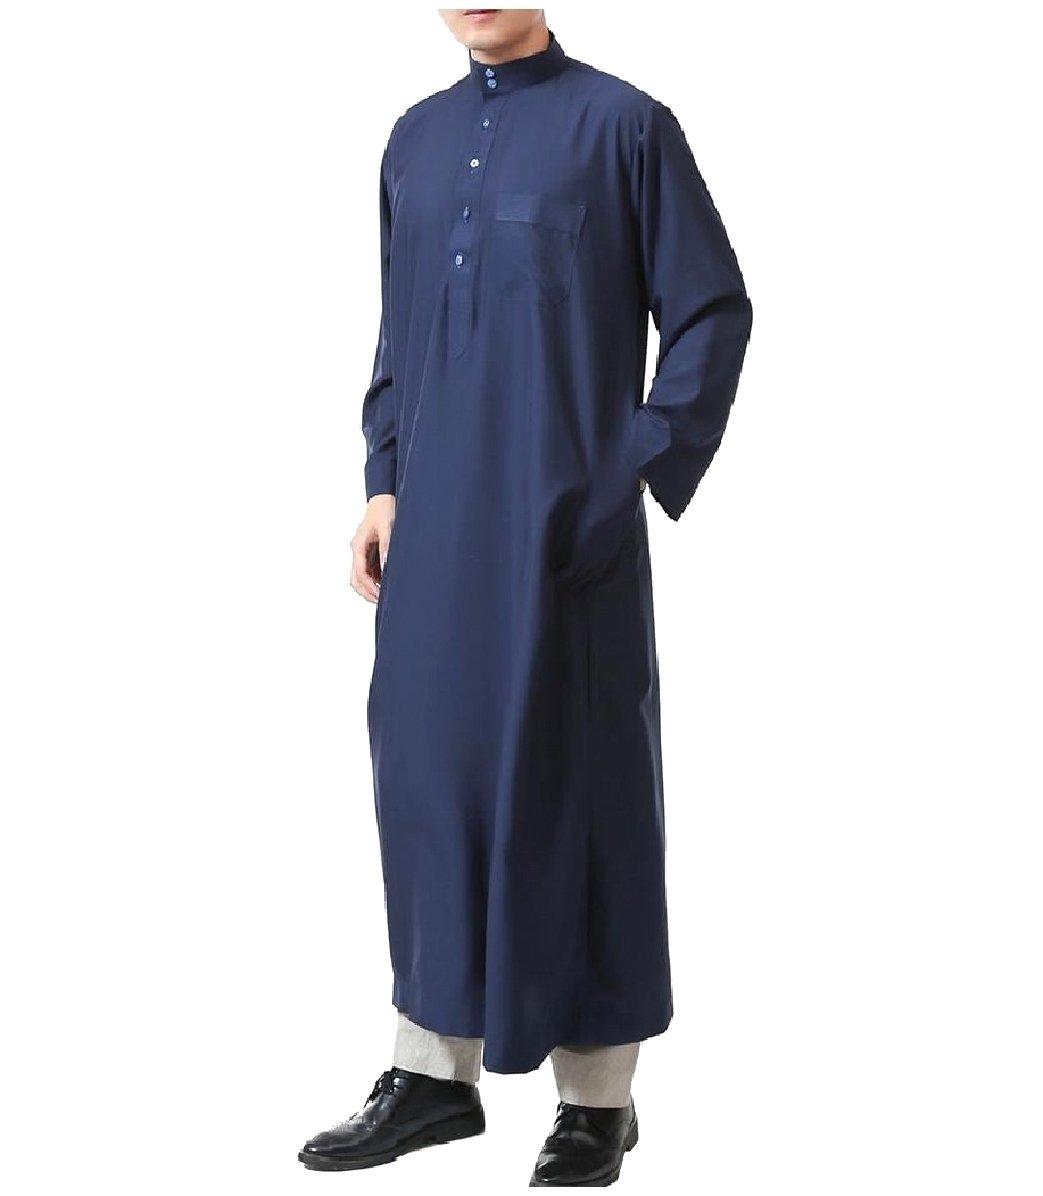 CuteRose Men's Islamic Pockets Mandarin Collar Middle East Muslim Thobe Navy Blue 52